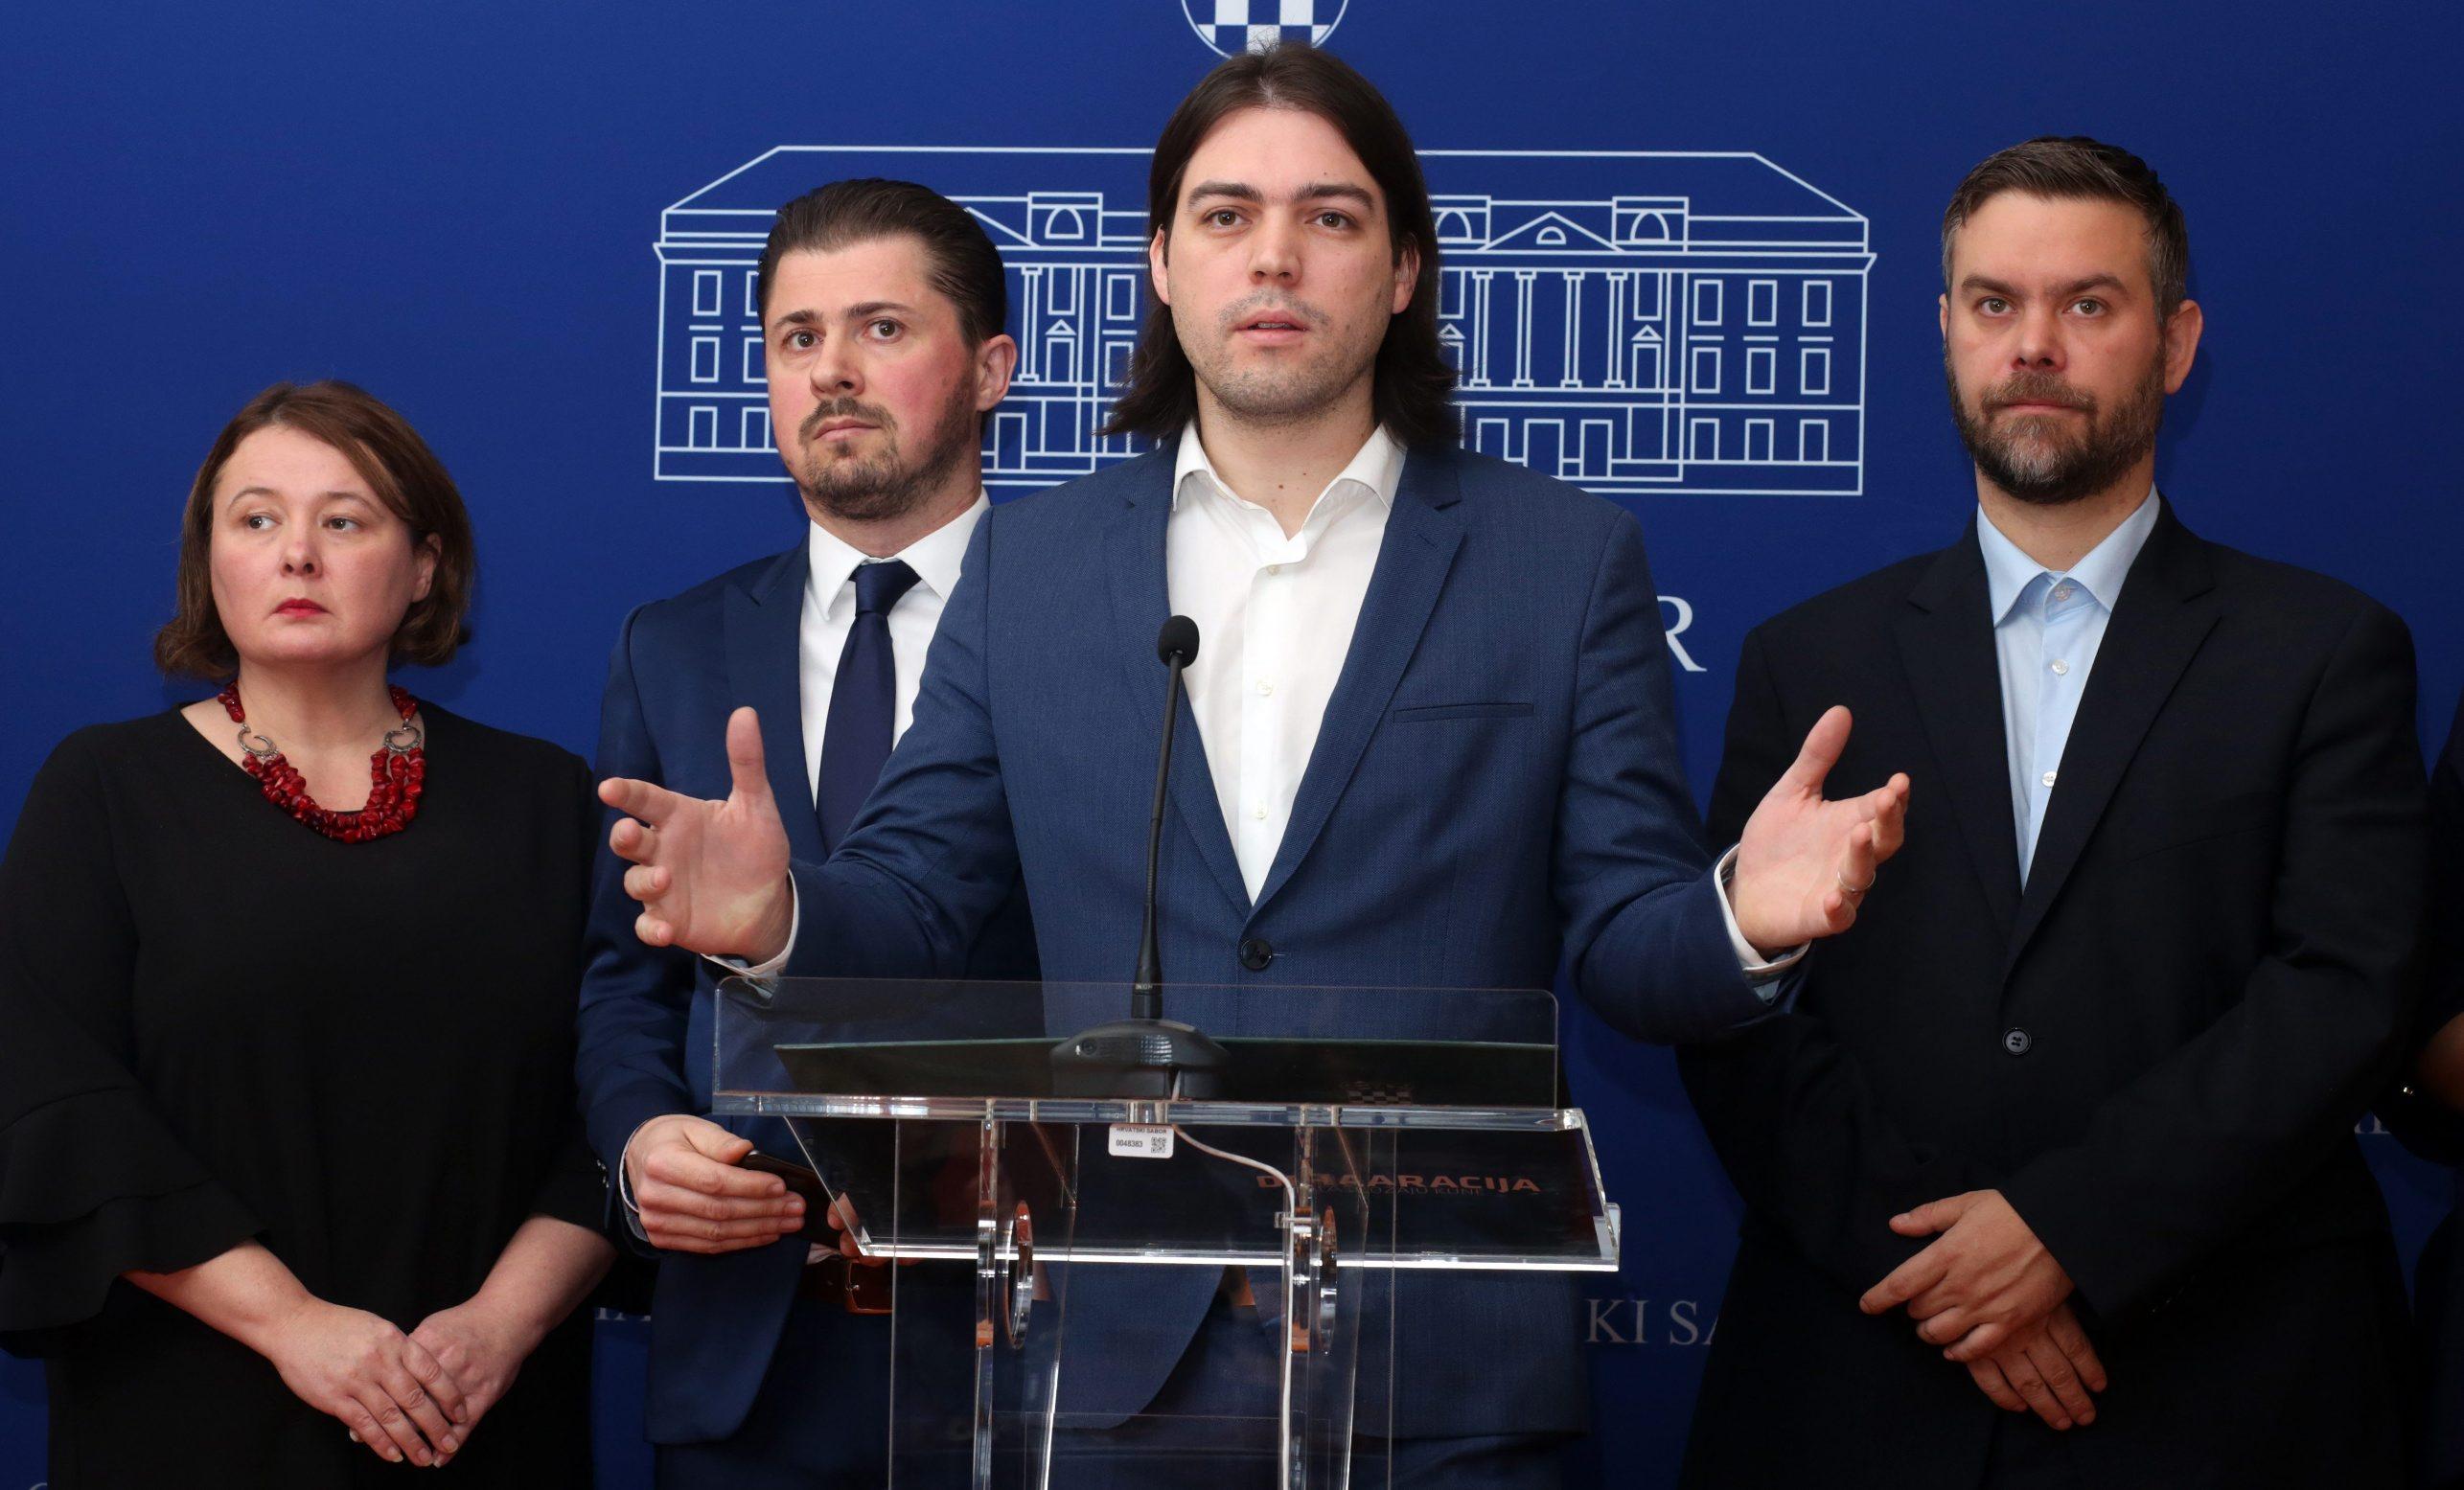 Snježana Sabolek,Tihomir Lukanić,Ivan Vilibor Sinčić, Damjan Vucelić, Vlasta Krpotić Mejić